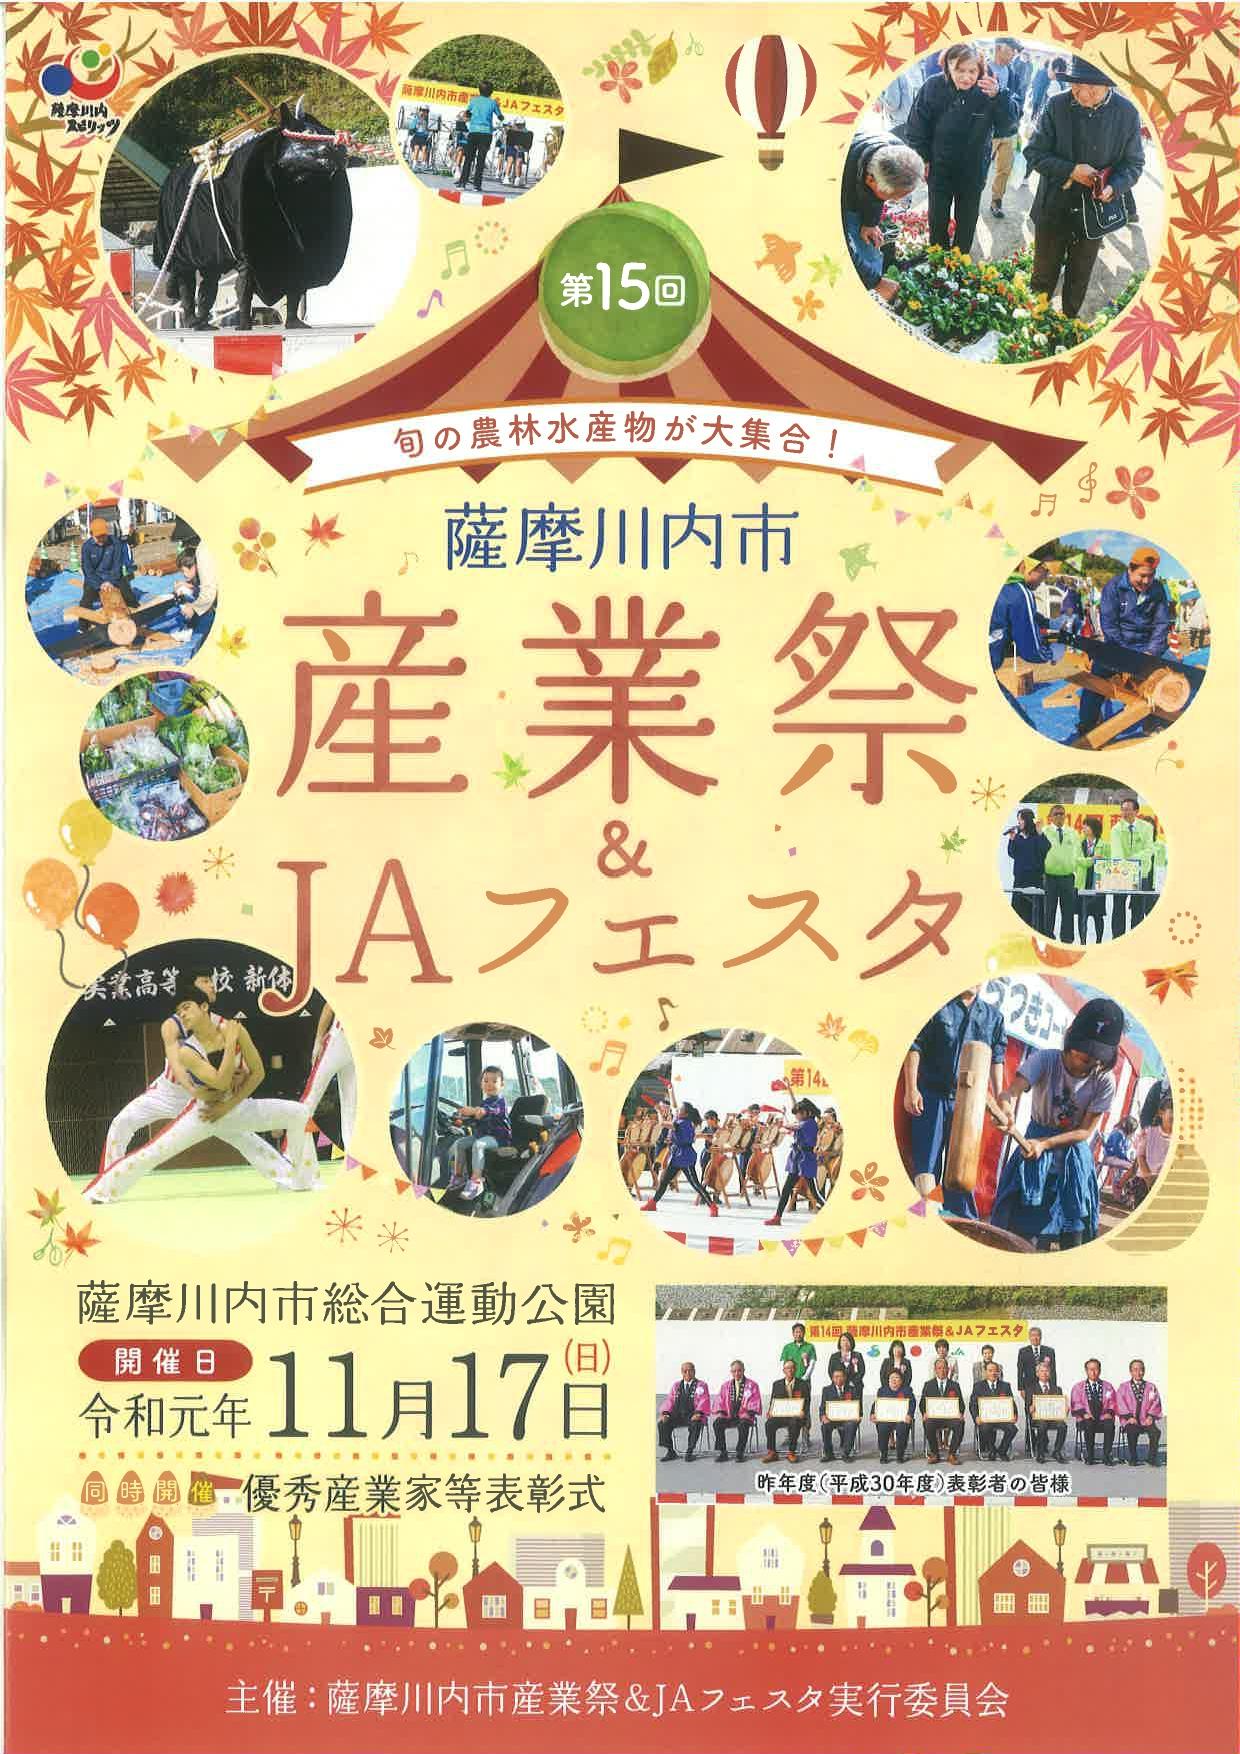 第15回薩摩川内市産業祭&JAフェスタ